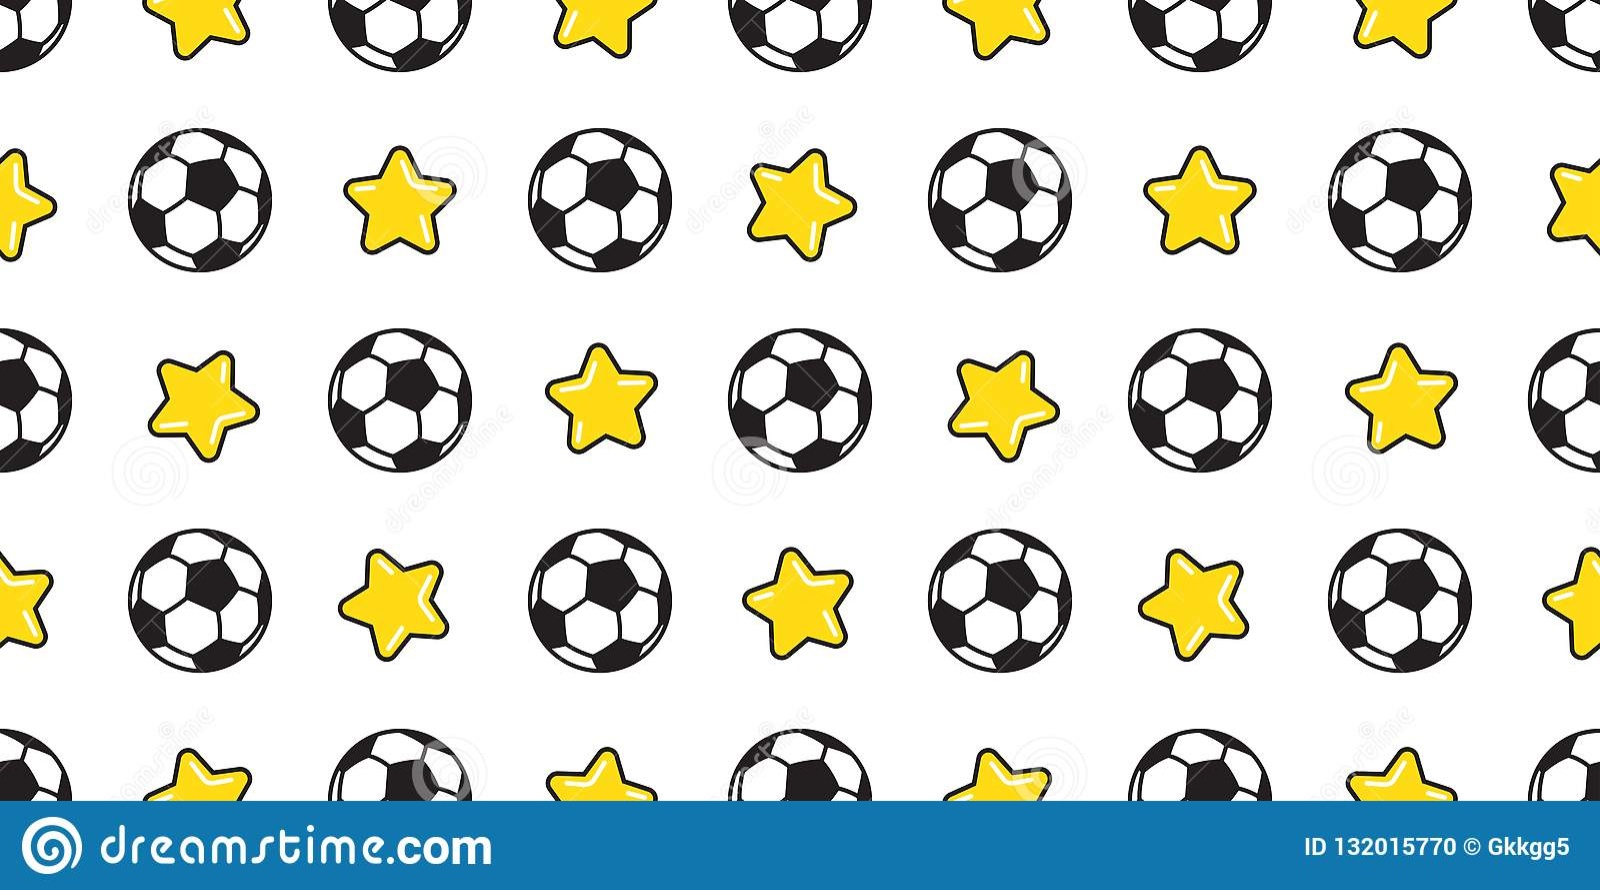 Pattern For Sport Wallpaper: Soccer Ball Seamless Pattern Vector Football Star Sport